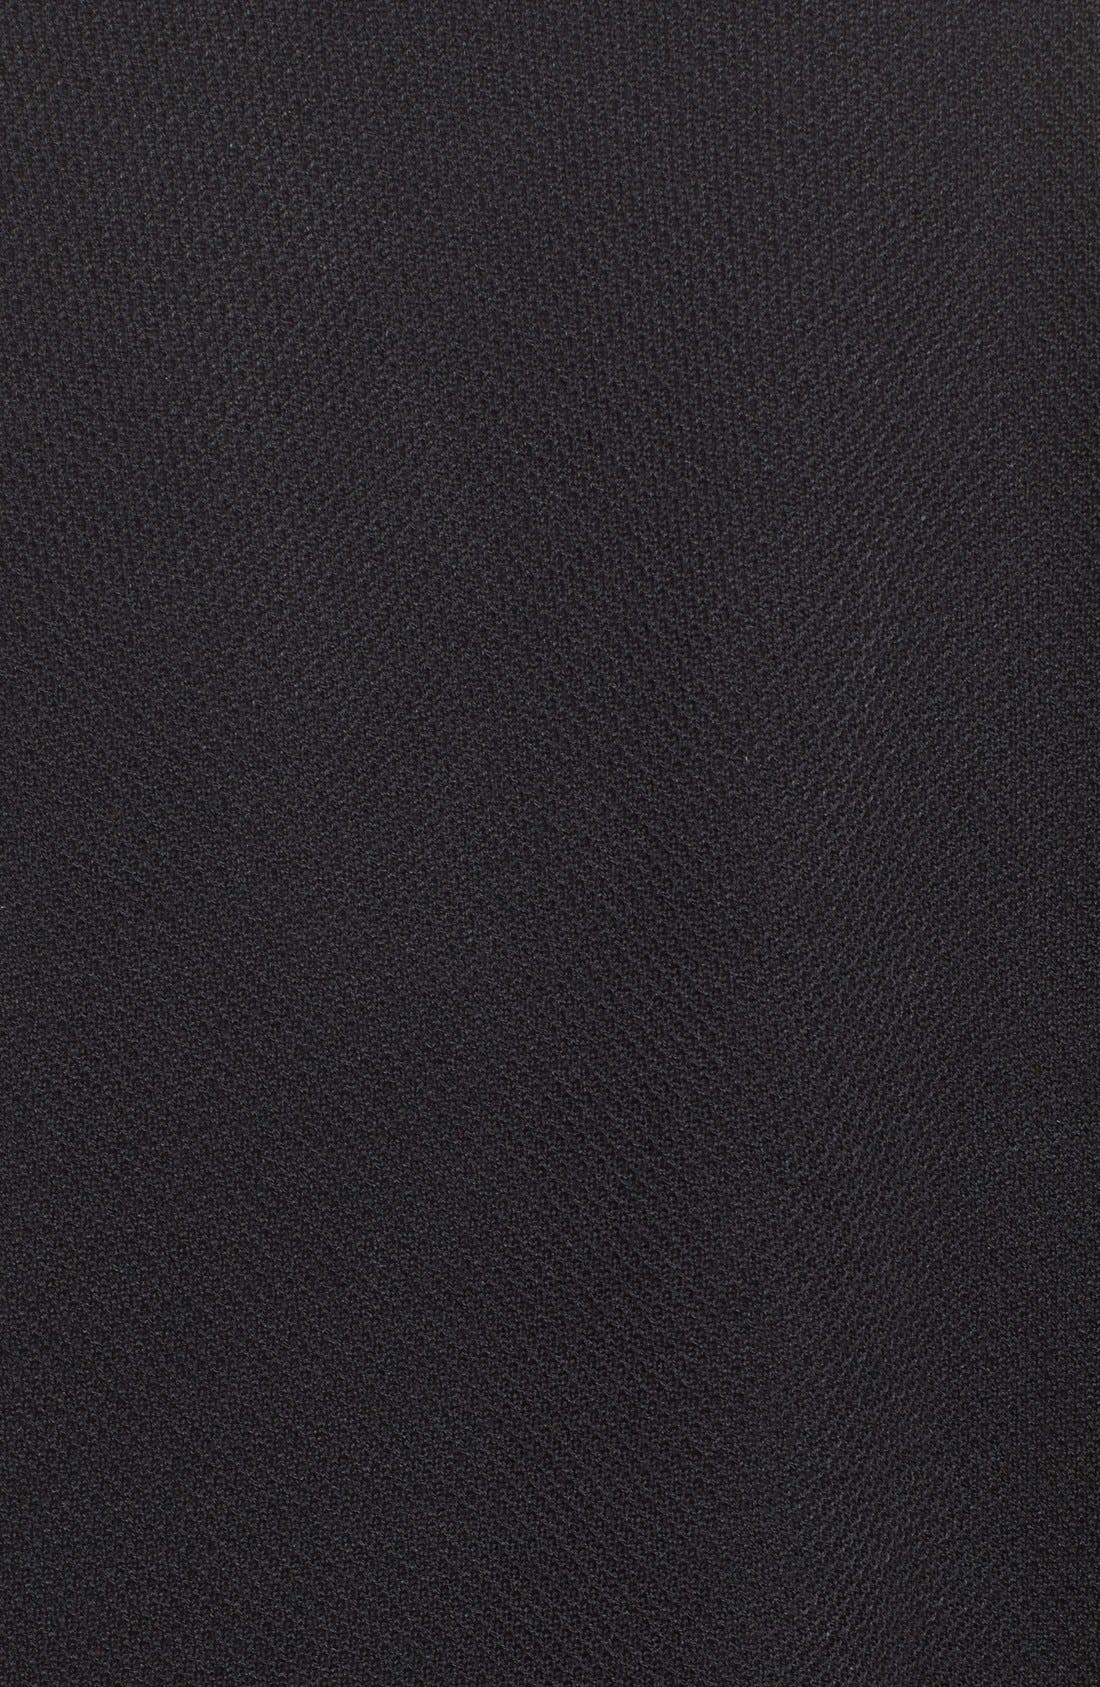 Fringe Trim Milano Piqué Knit Coat,                             Alternate thumbnail 9, color,                             CAVIAR